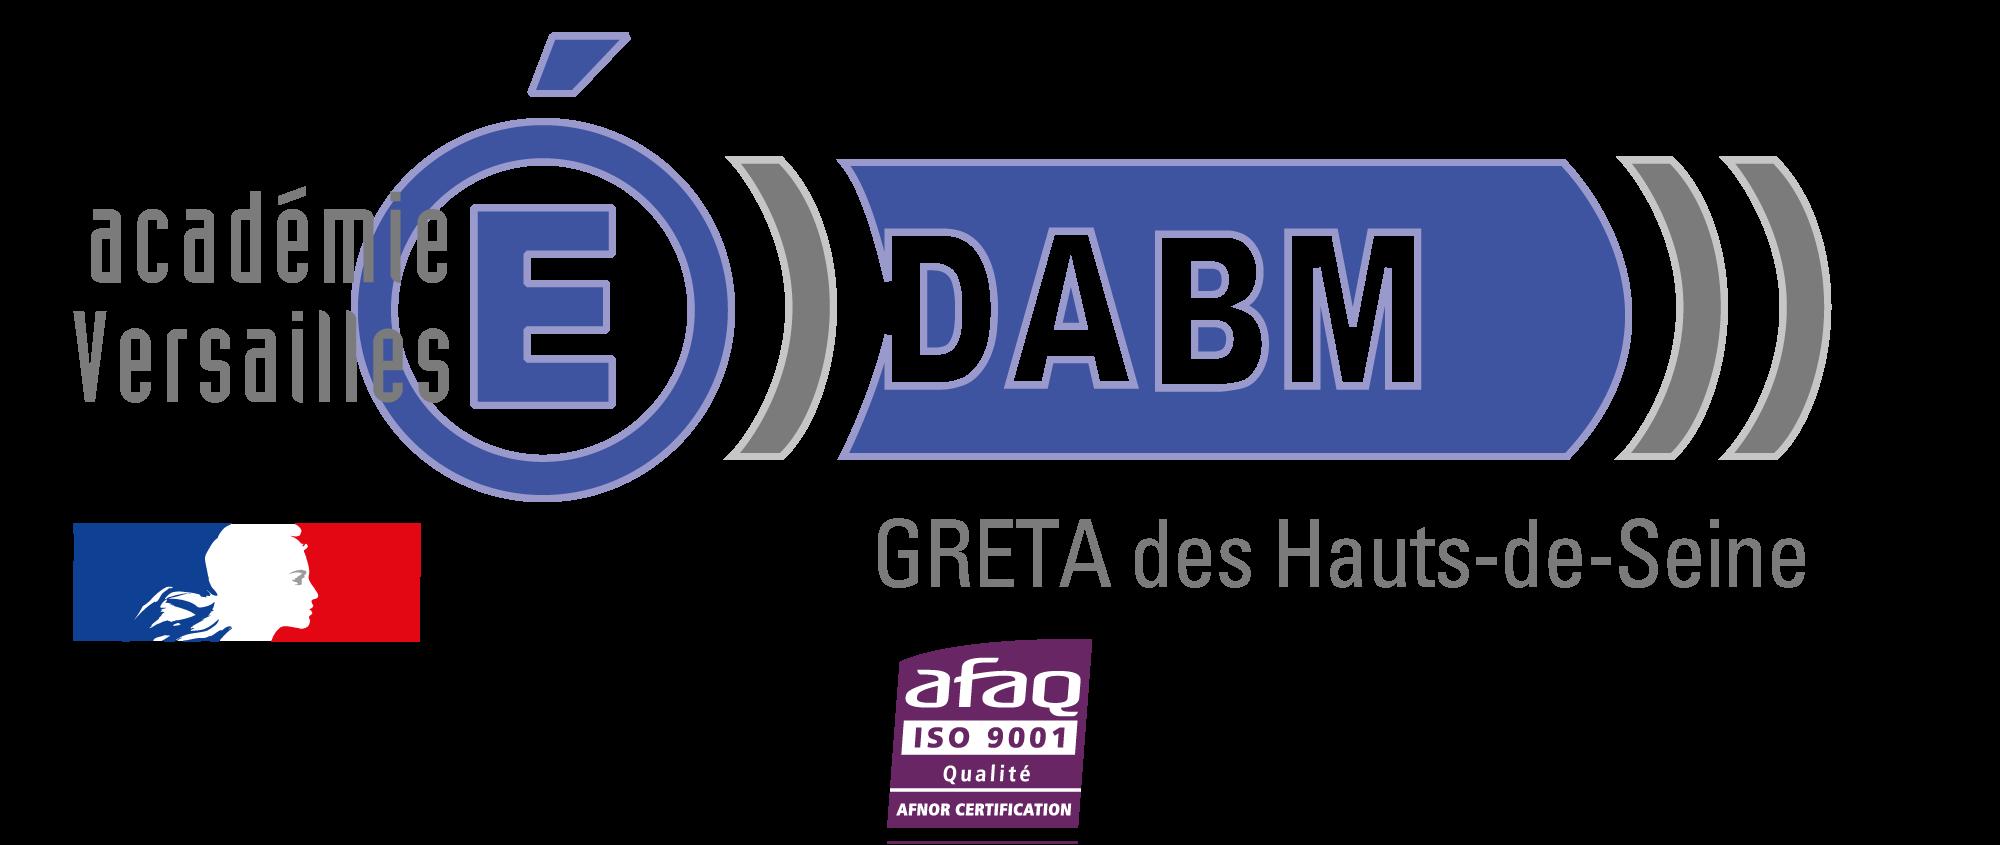 Centre DABM 92 - VAE Nanterre